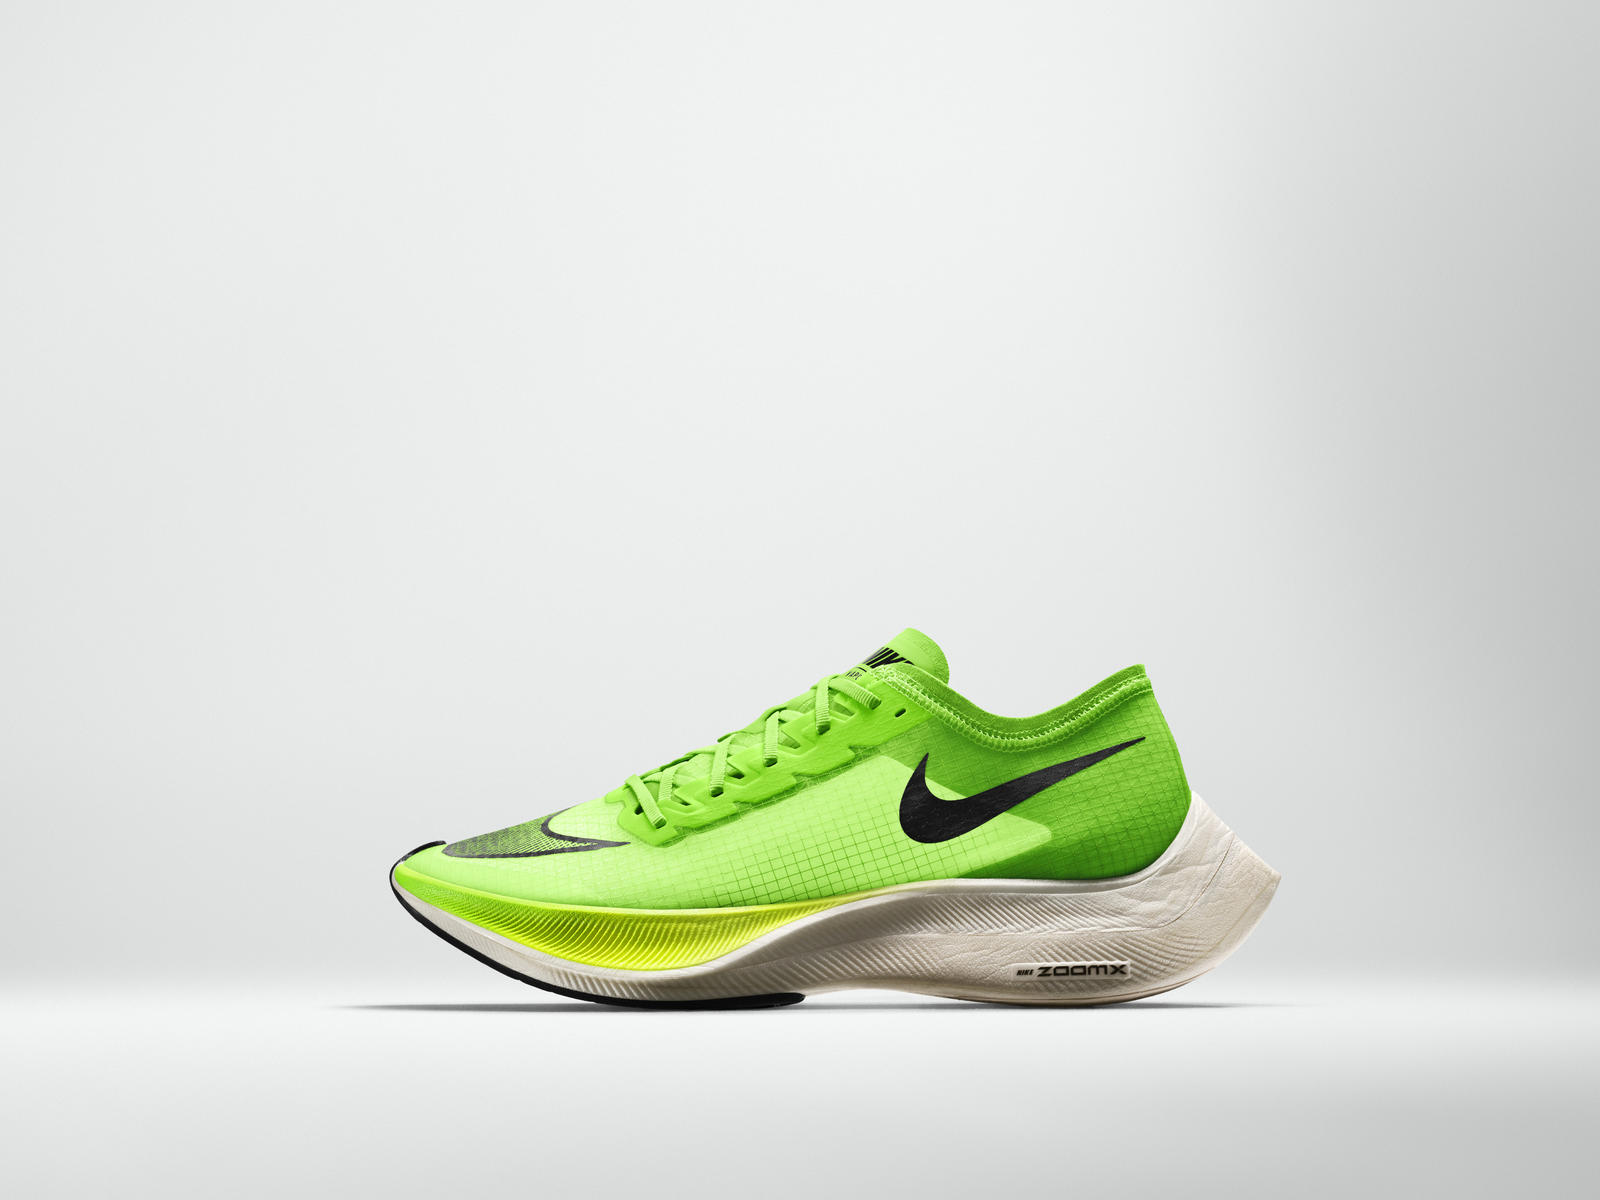 La nouvelle Nike ZoomX Vaporfly NEXT% – U Run